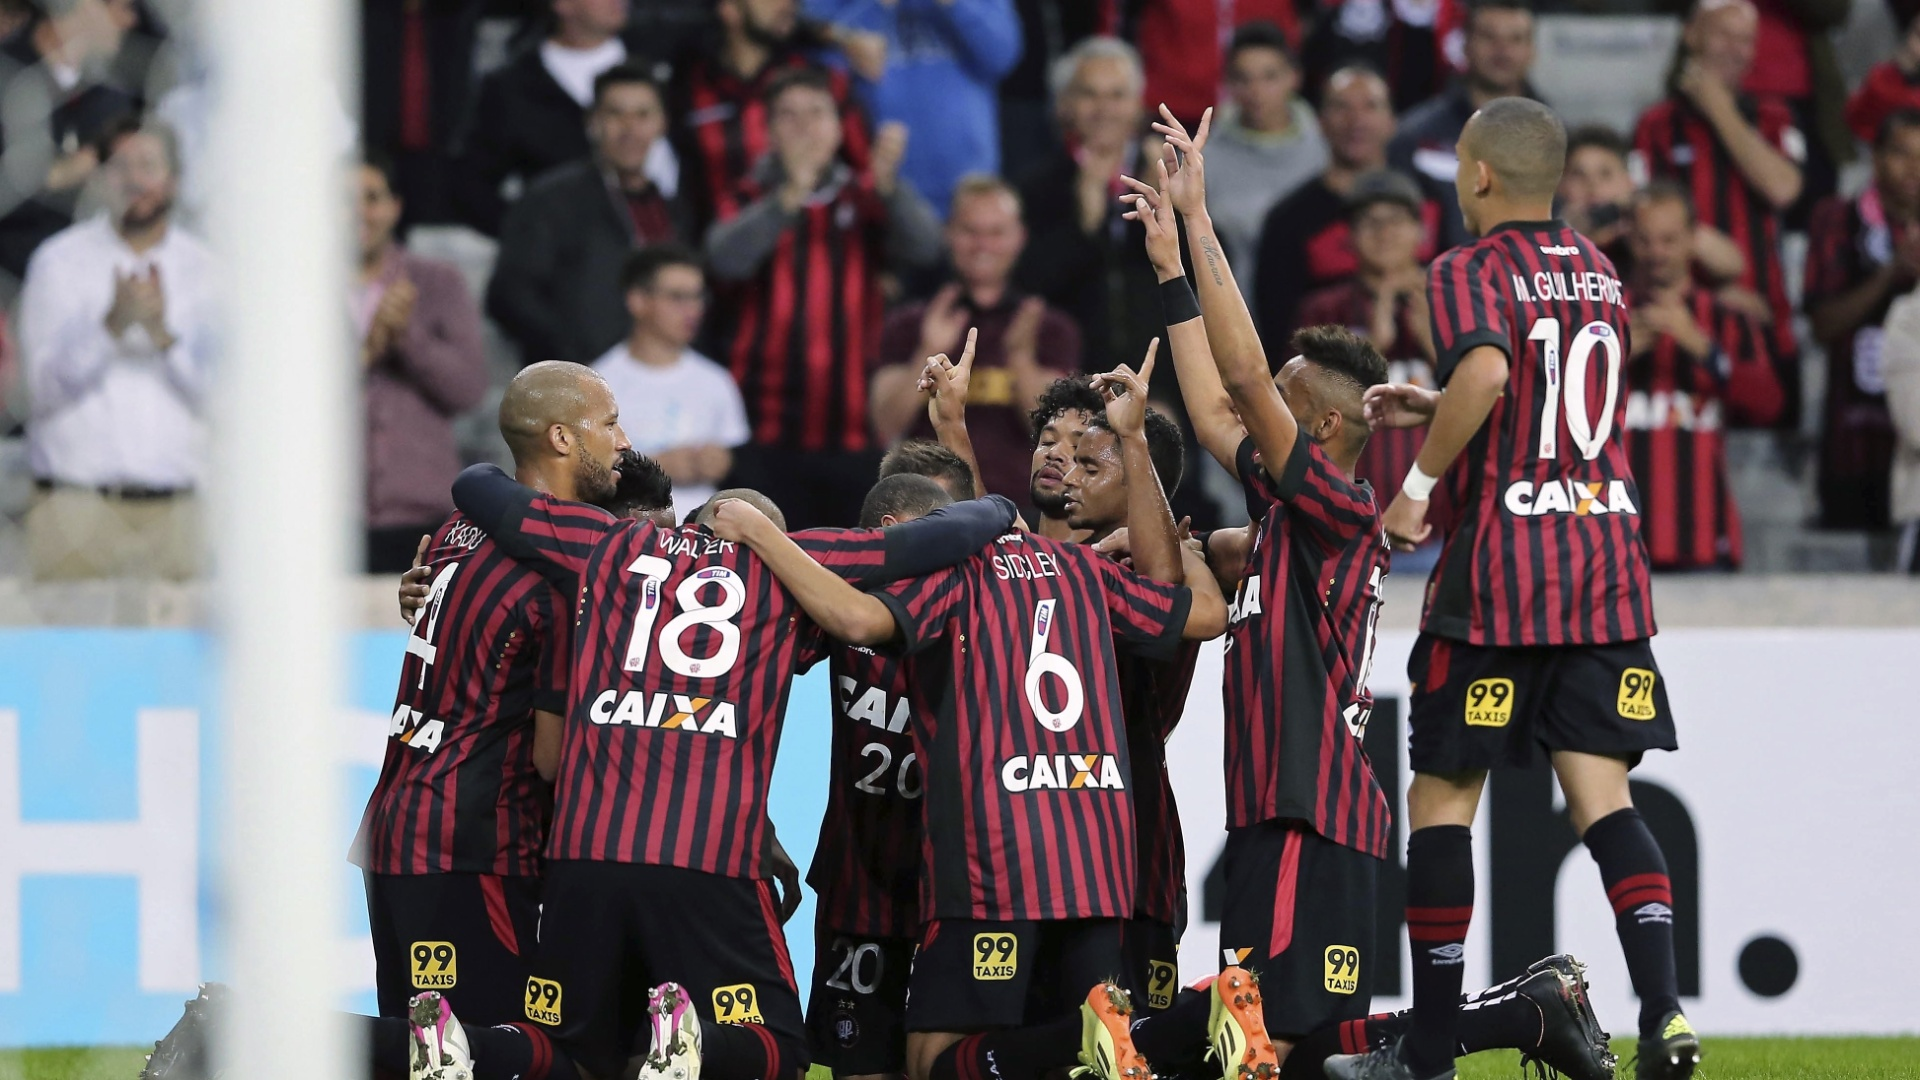 Jogadores do Atlético-PR comemoram gol marcado contra o Joinville, na Copa Sul-Americana